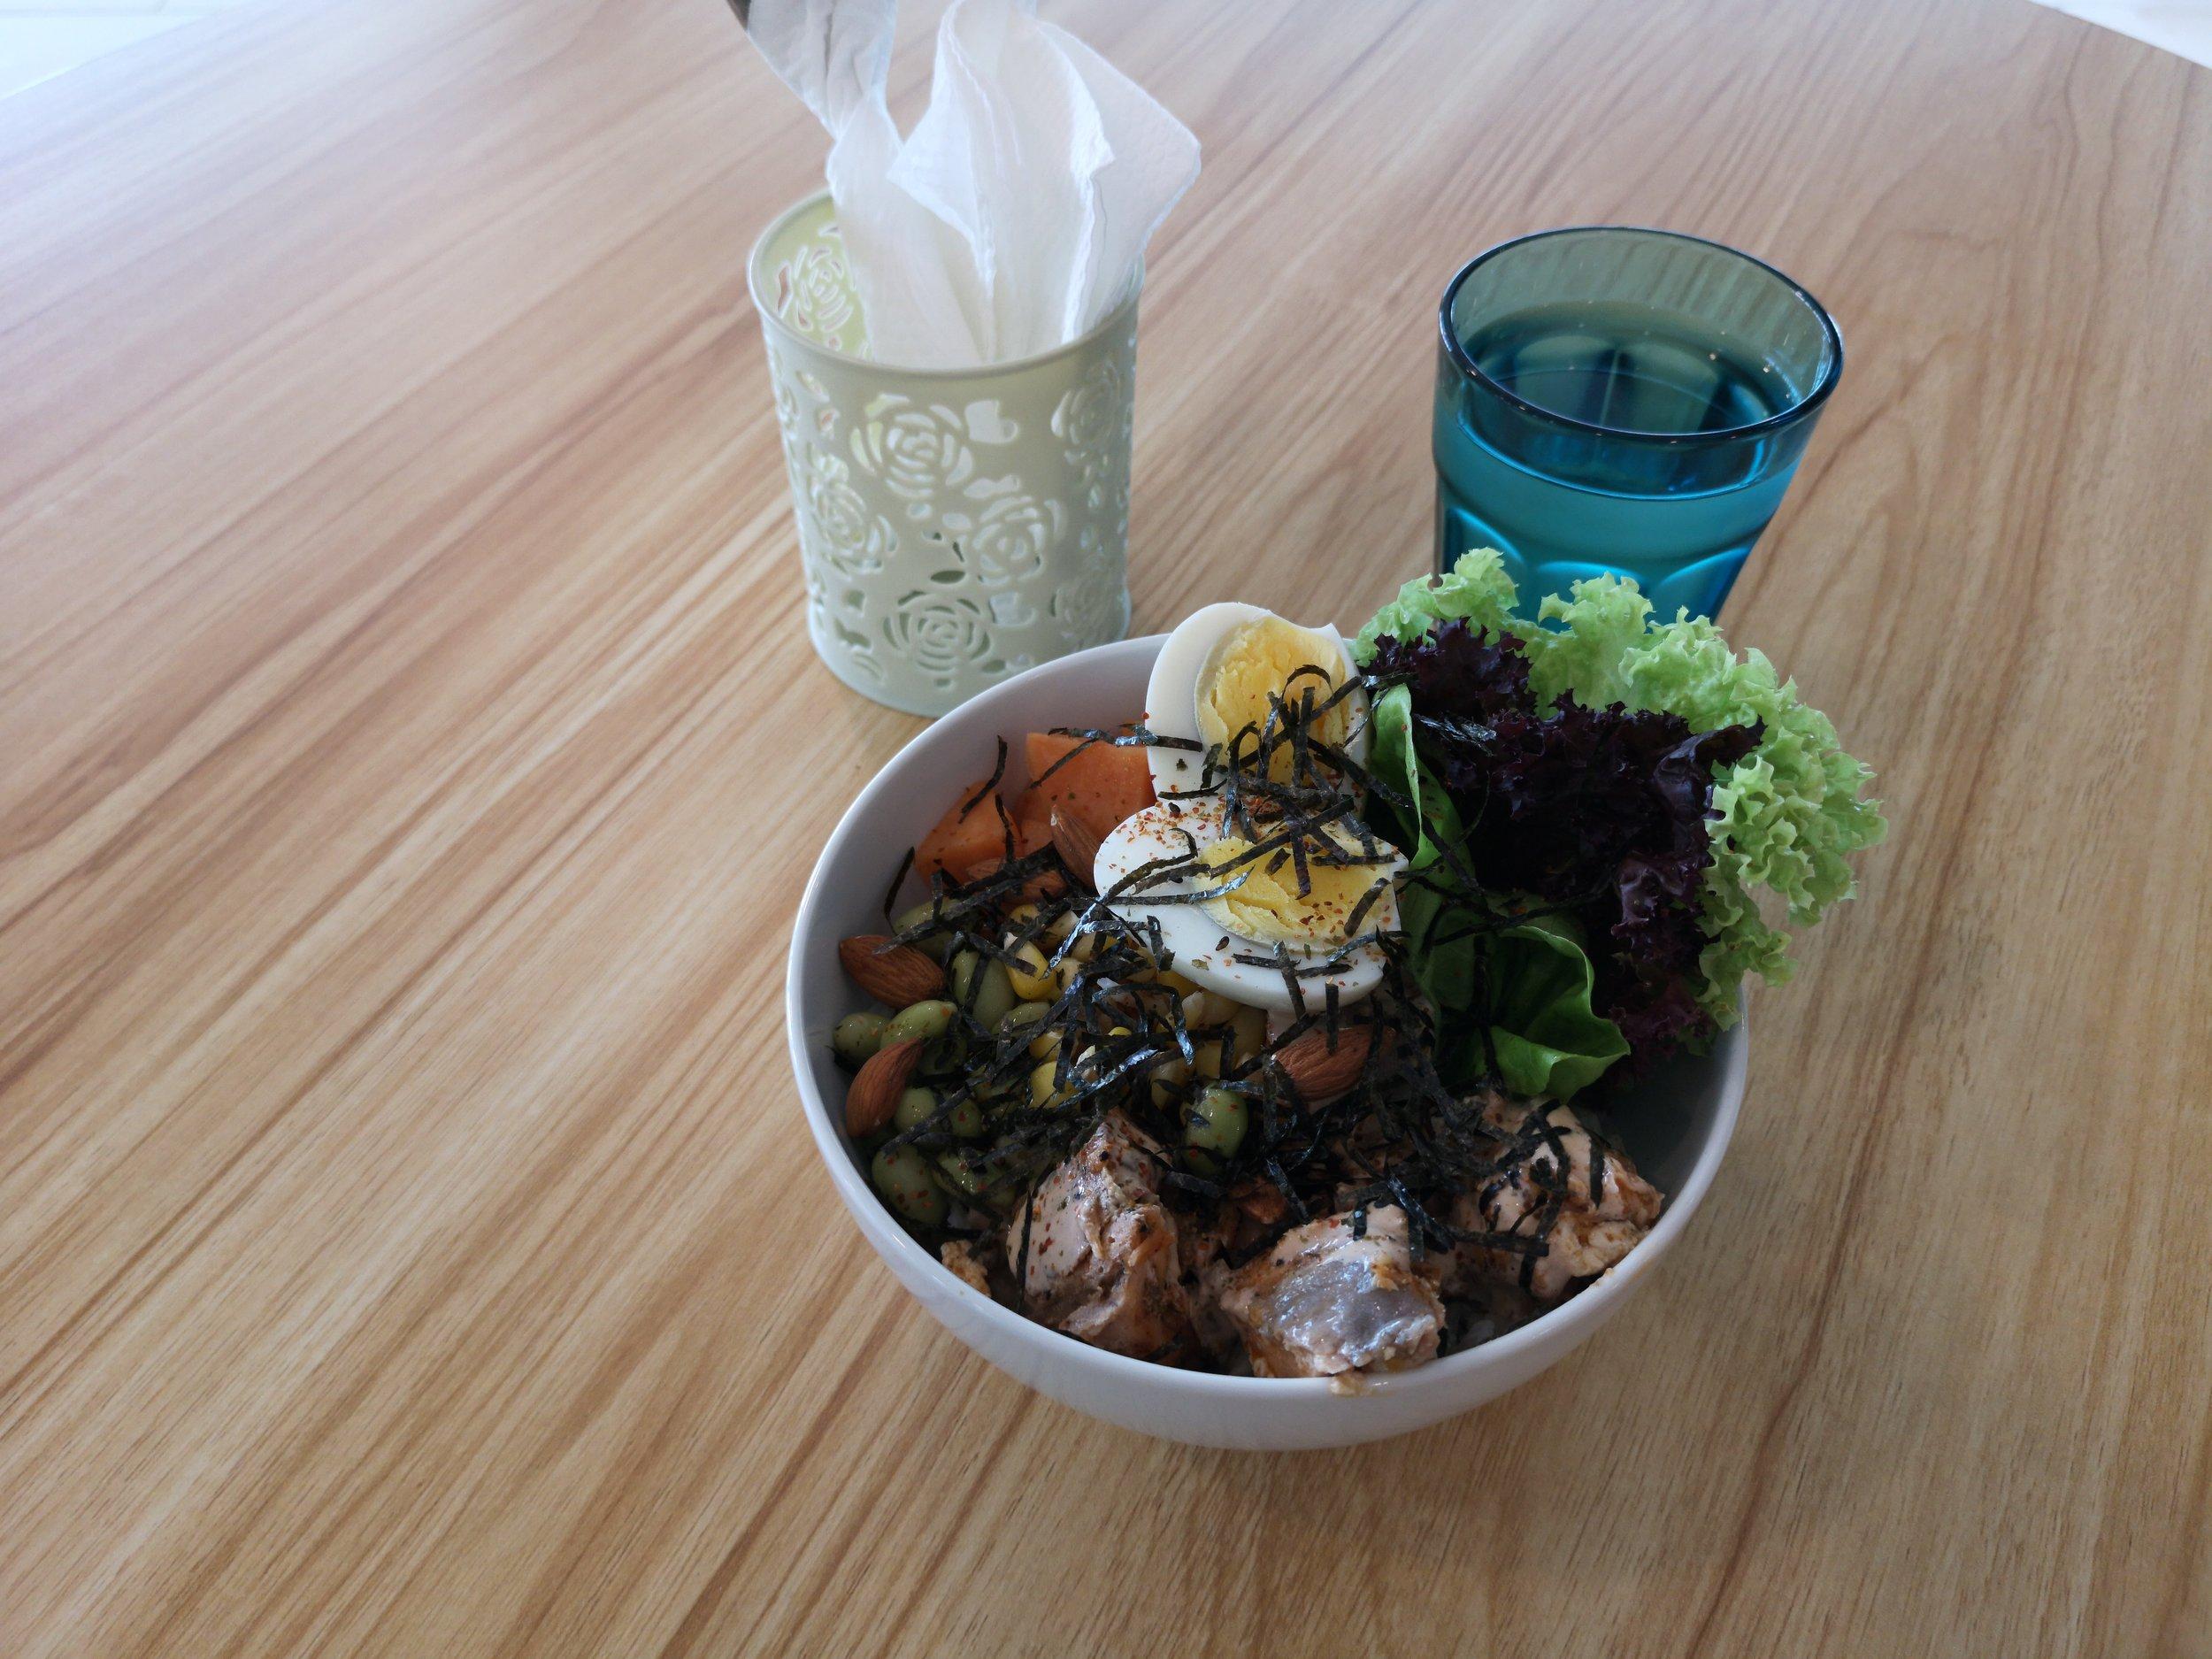 PekoPeko Cafe Poke Bowl (Complimentary water as well, service is good!)